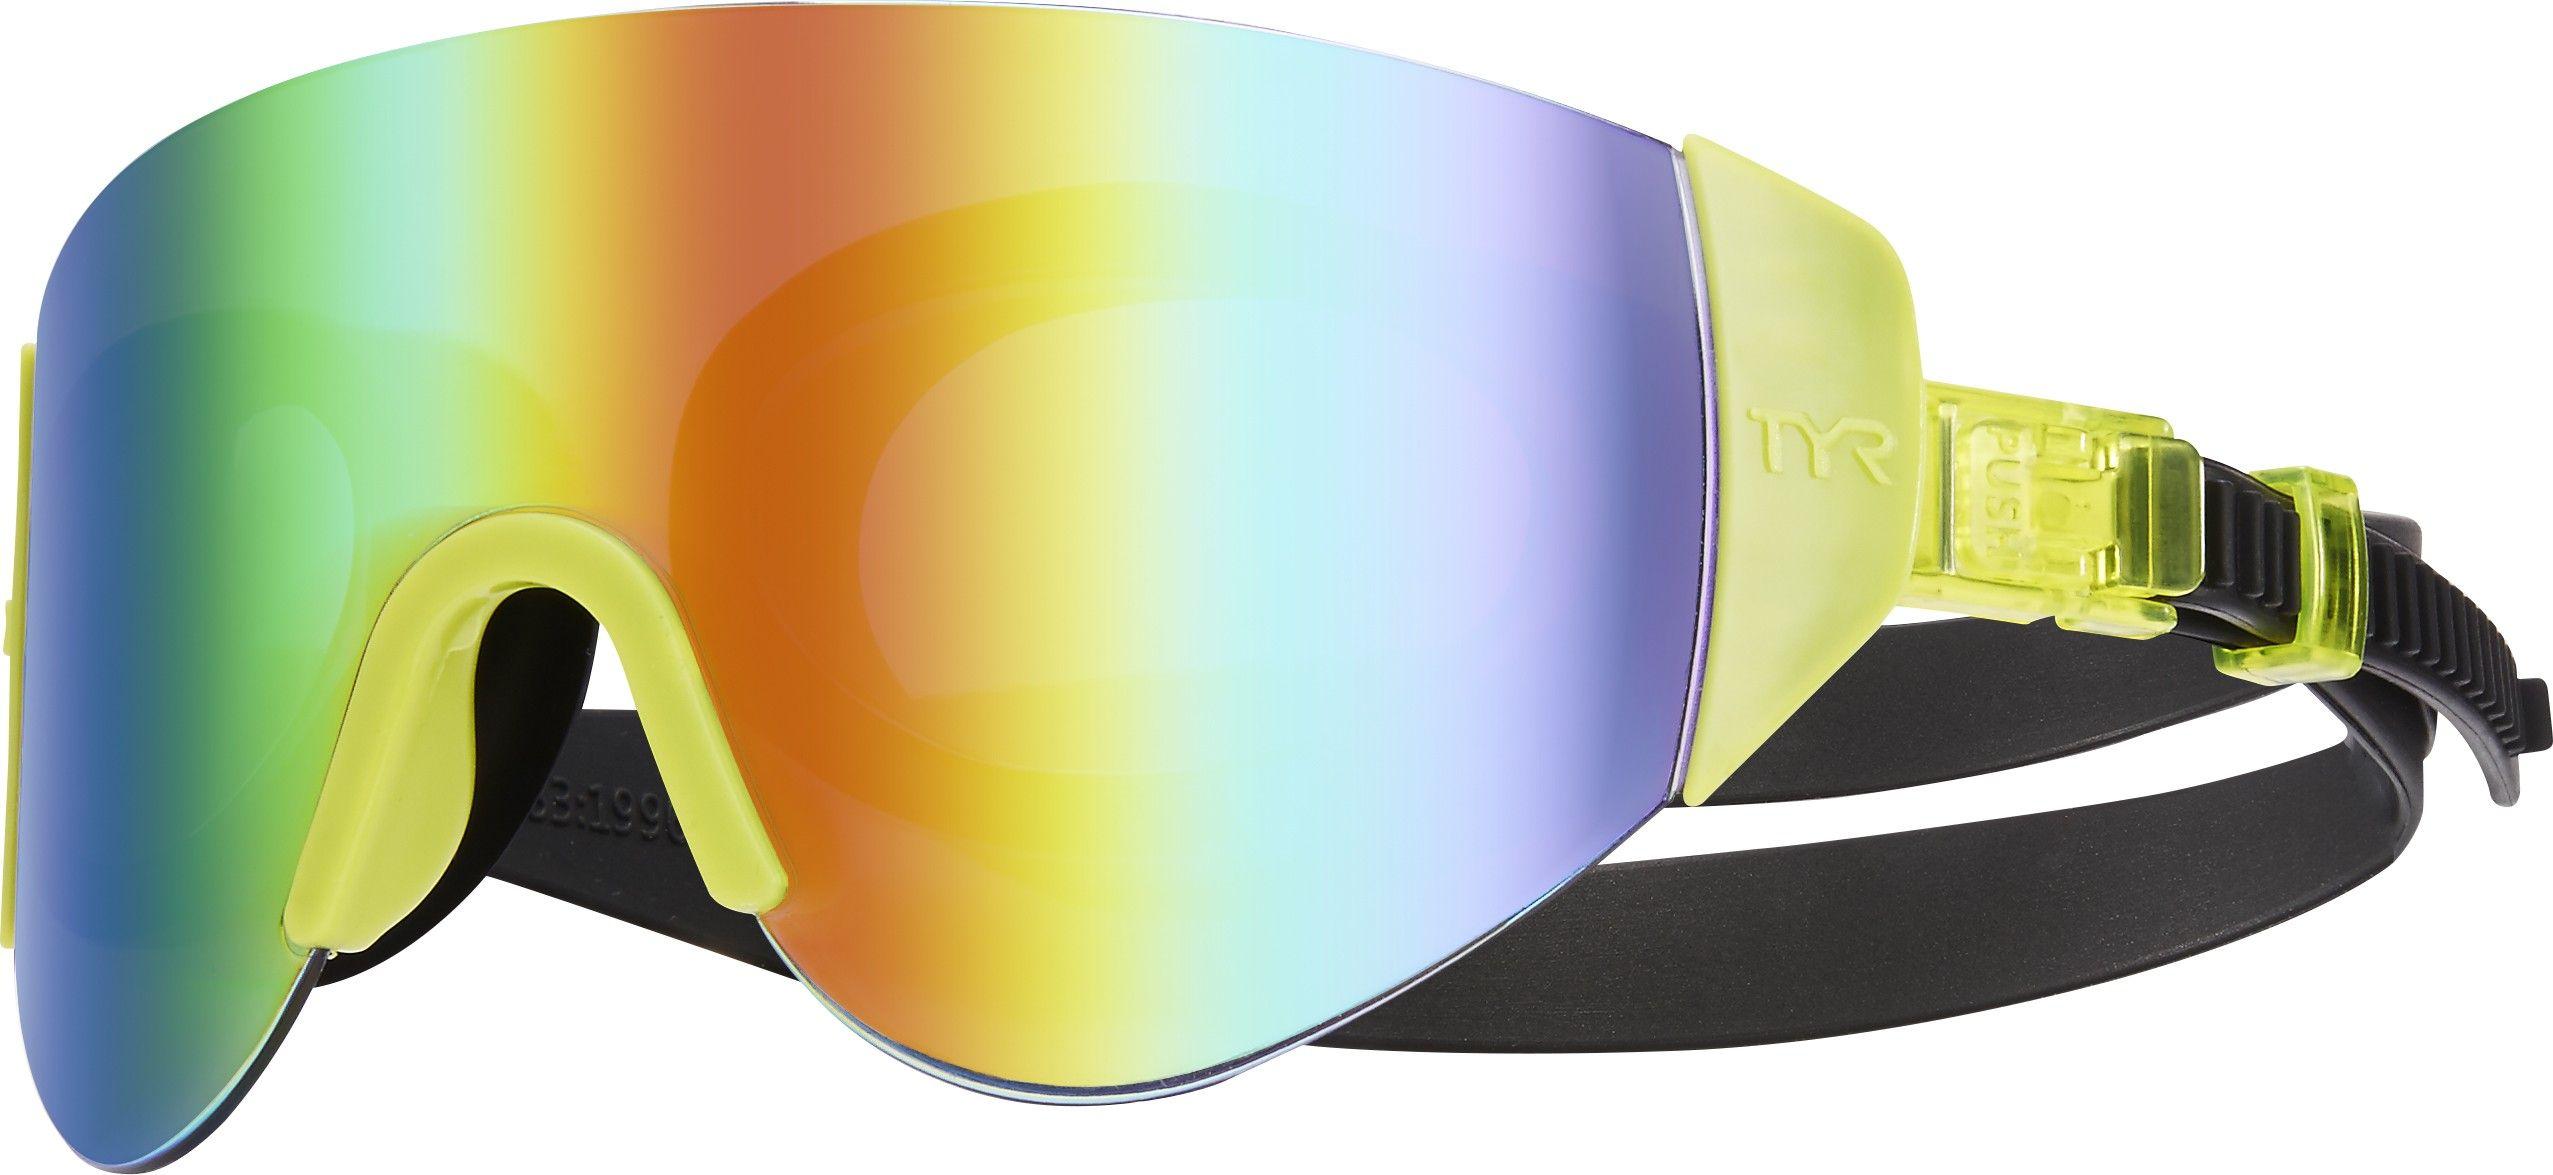 9c93cb6e306 Renegade Swim Shades Mirrored - TYR - All Brands - GOGGLES